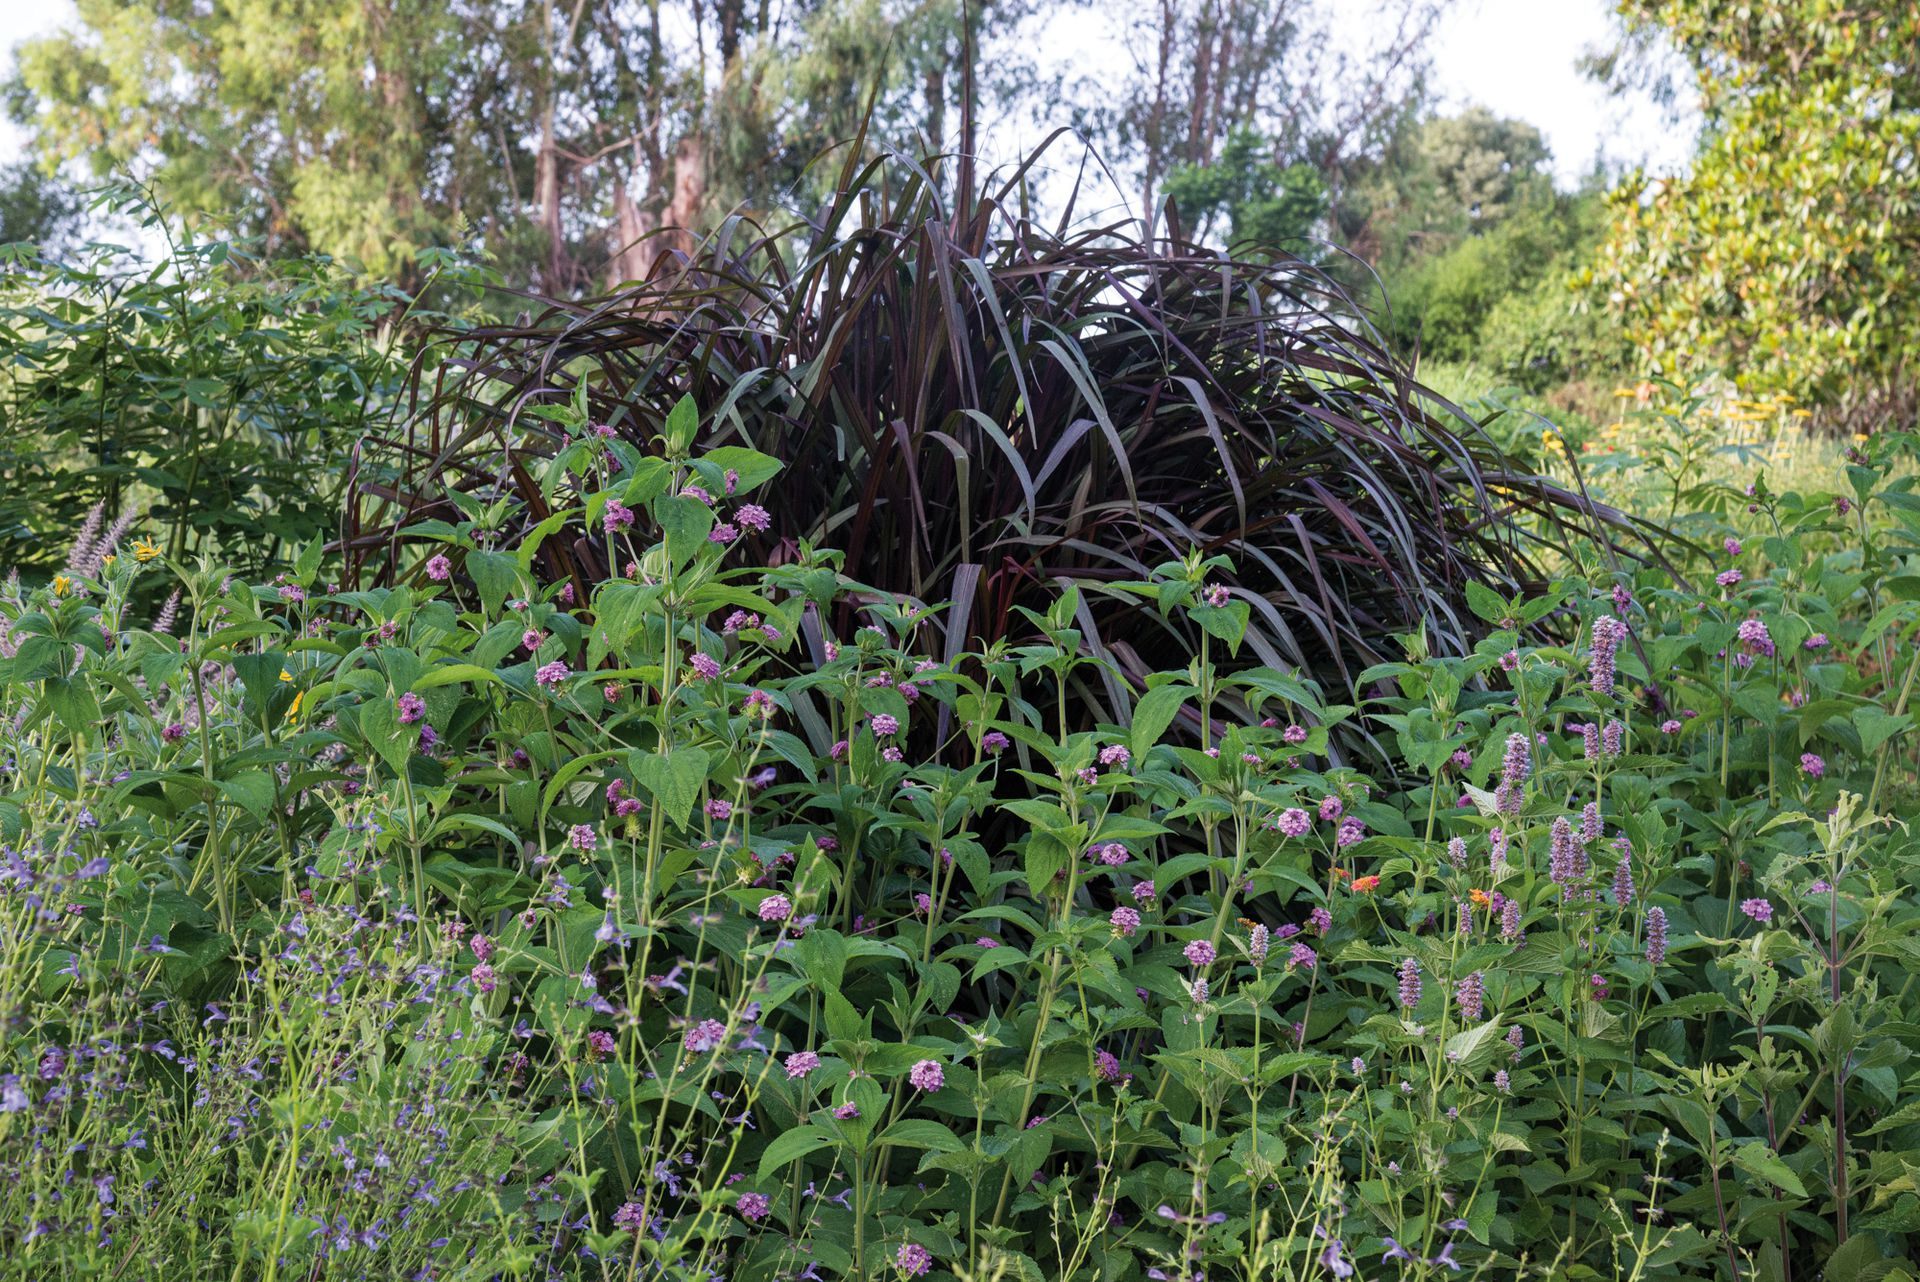 Combinacion de Pennisetum purpureum 'Majestic', Lantana trifolia y Agastache foeniculum.